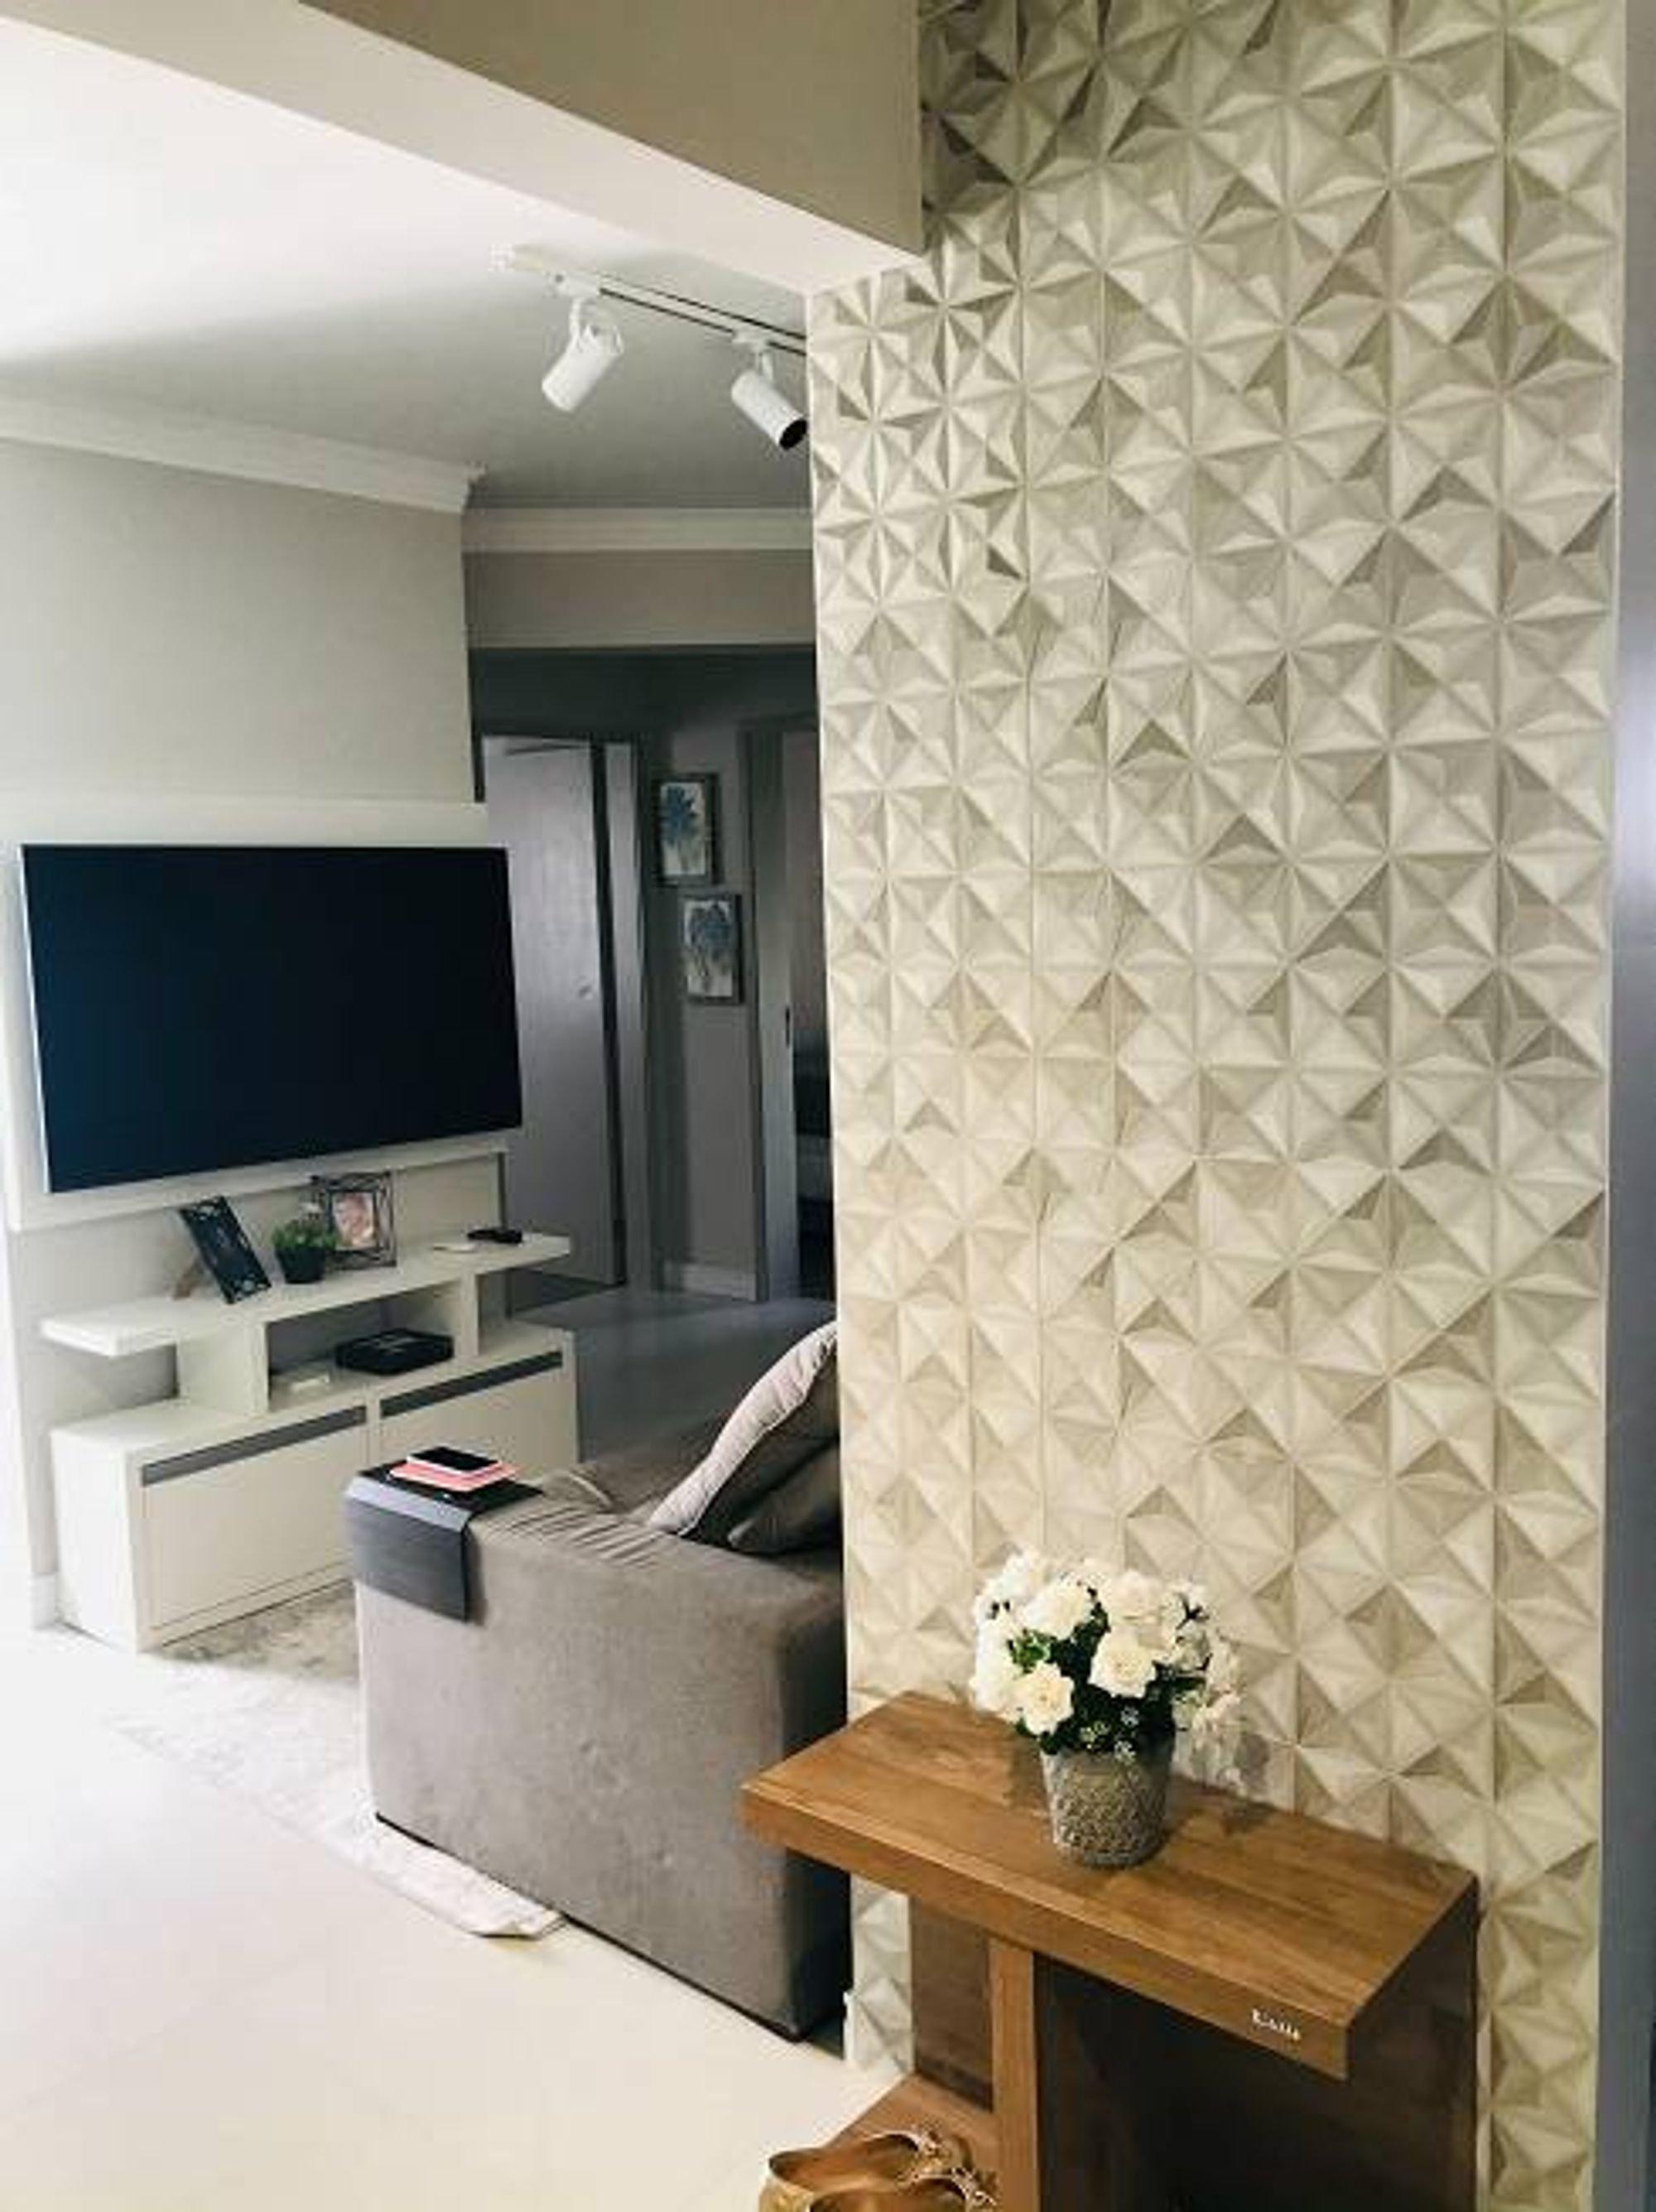 Foto de Sala com vaso de planta, sofá, televisão, vaso, livro